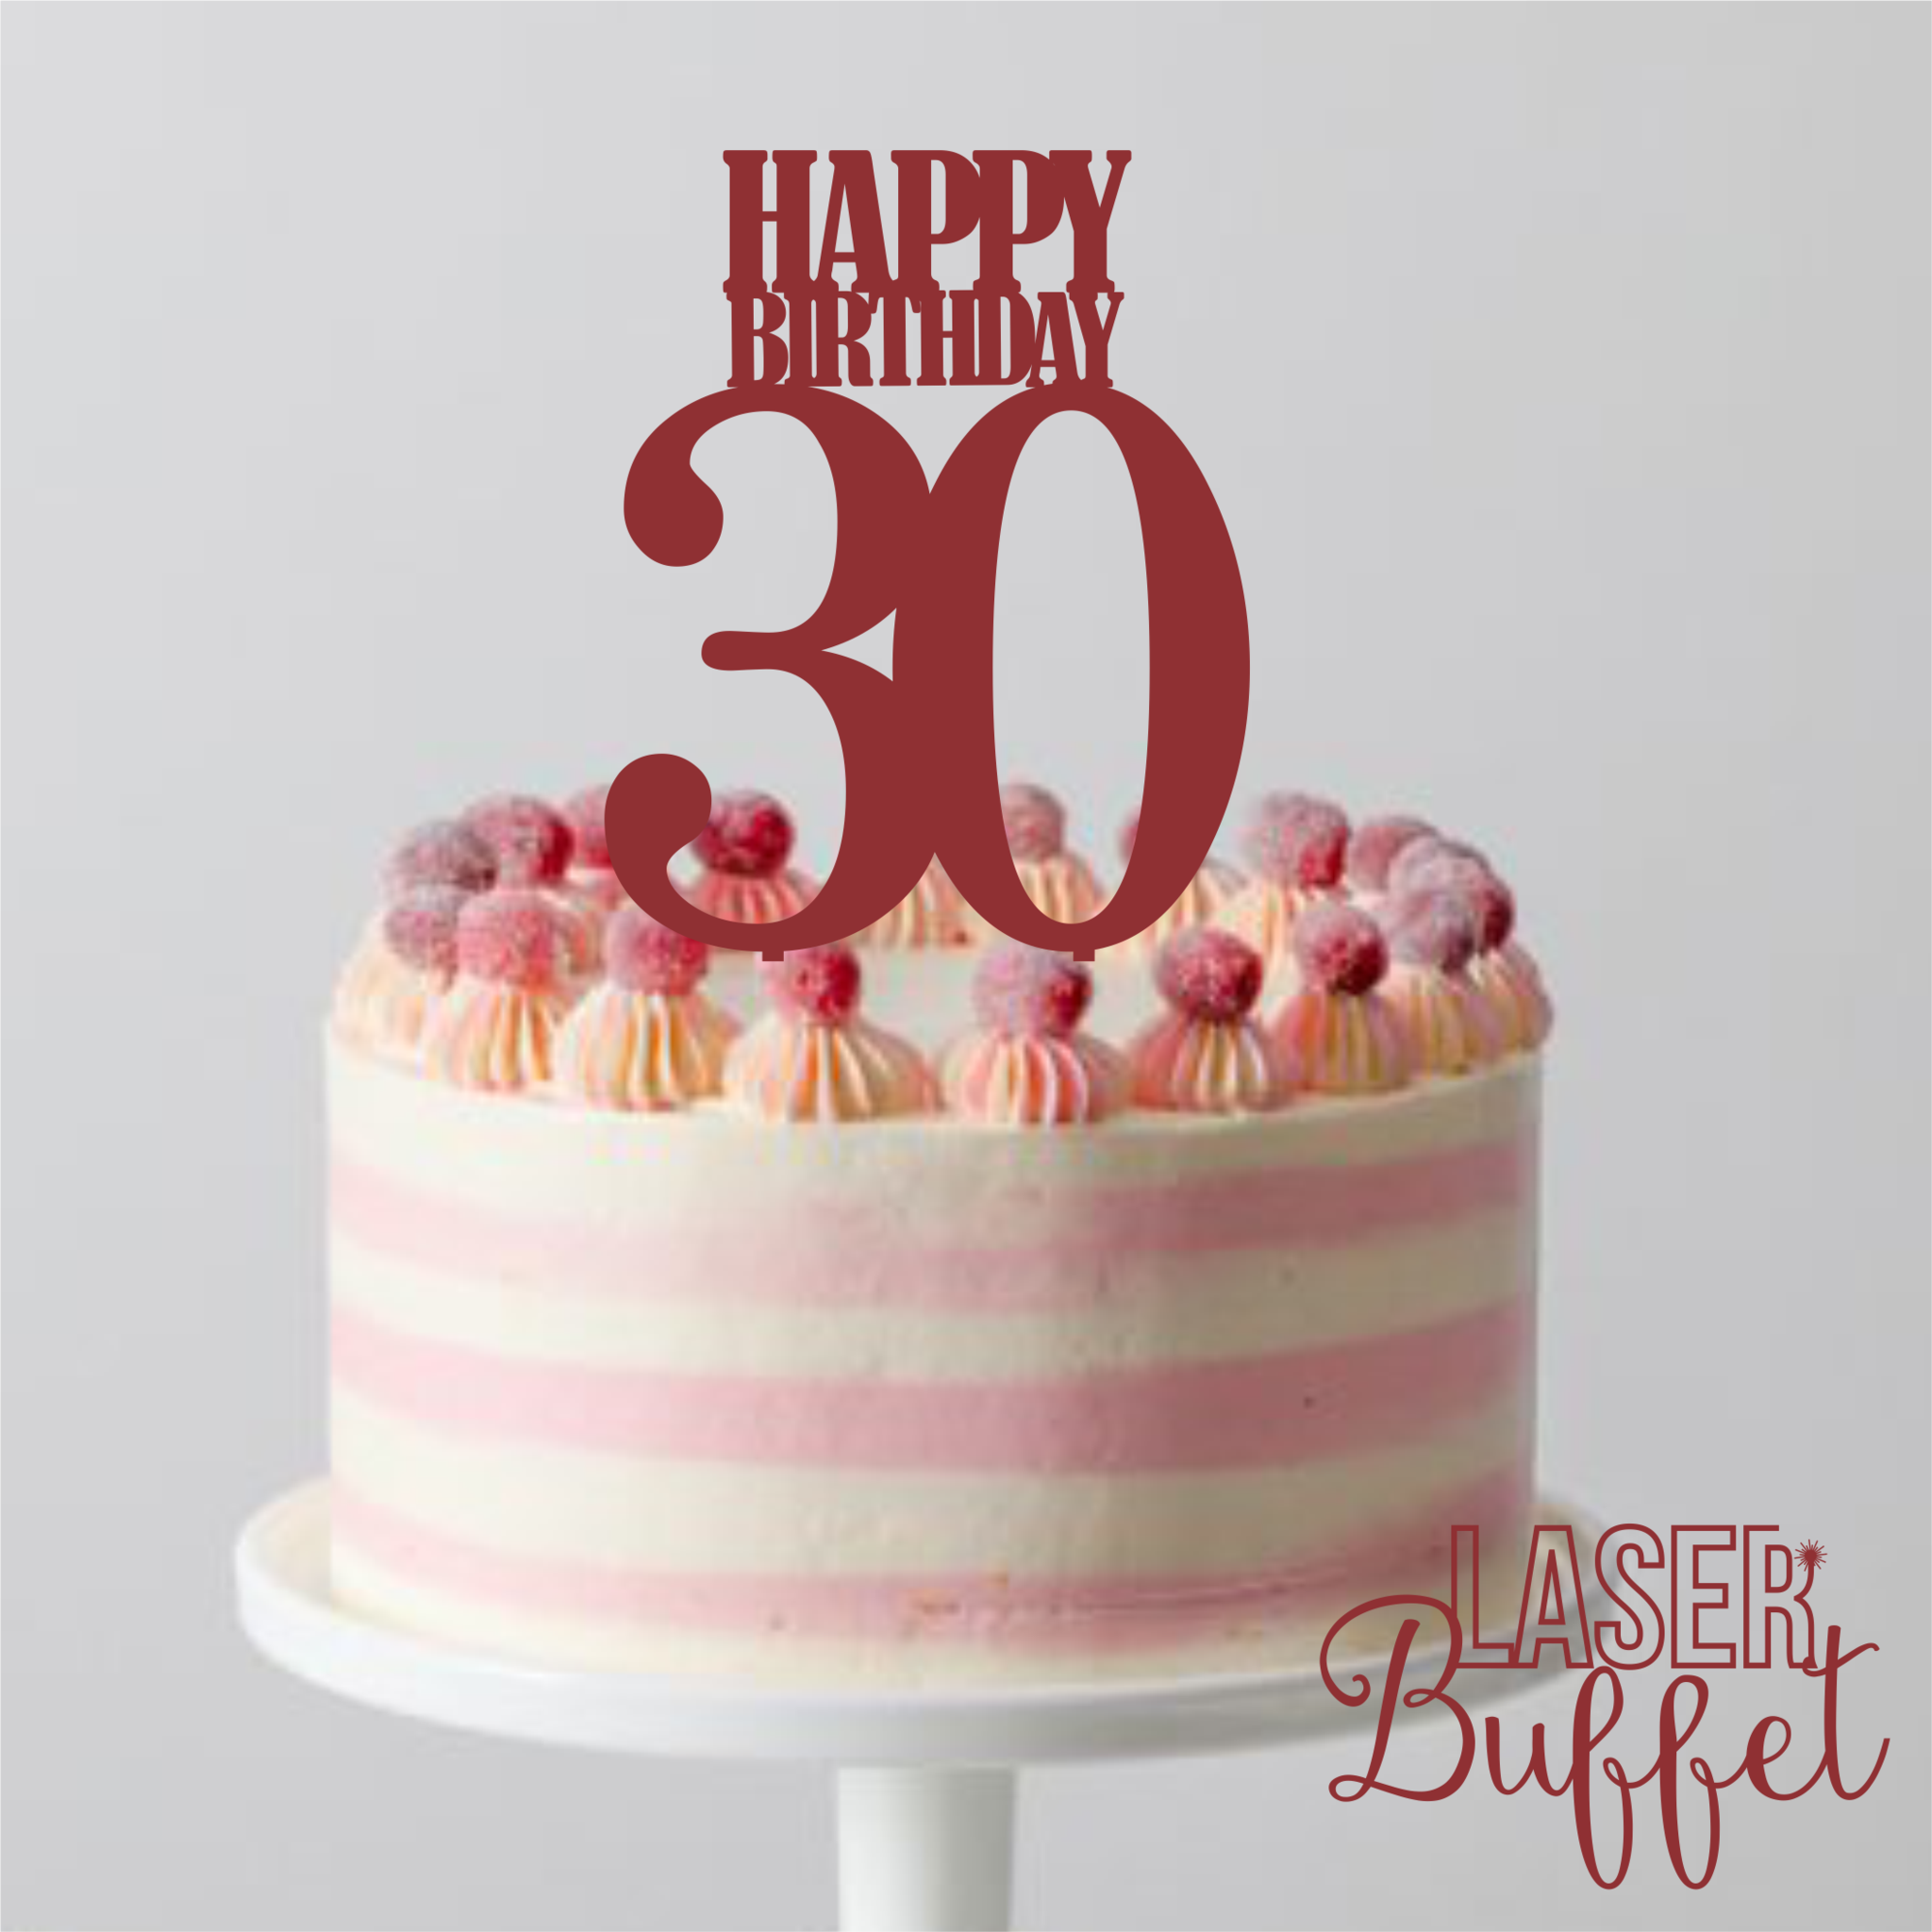 Laser Cut Happy Birthday 30 Cake Topper Template Shop Designs